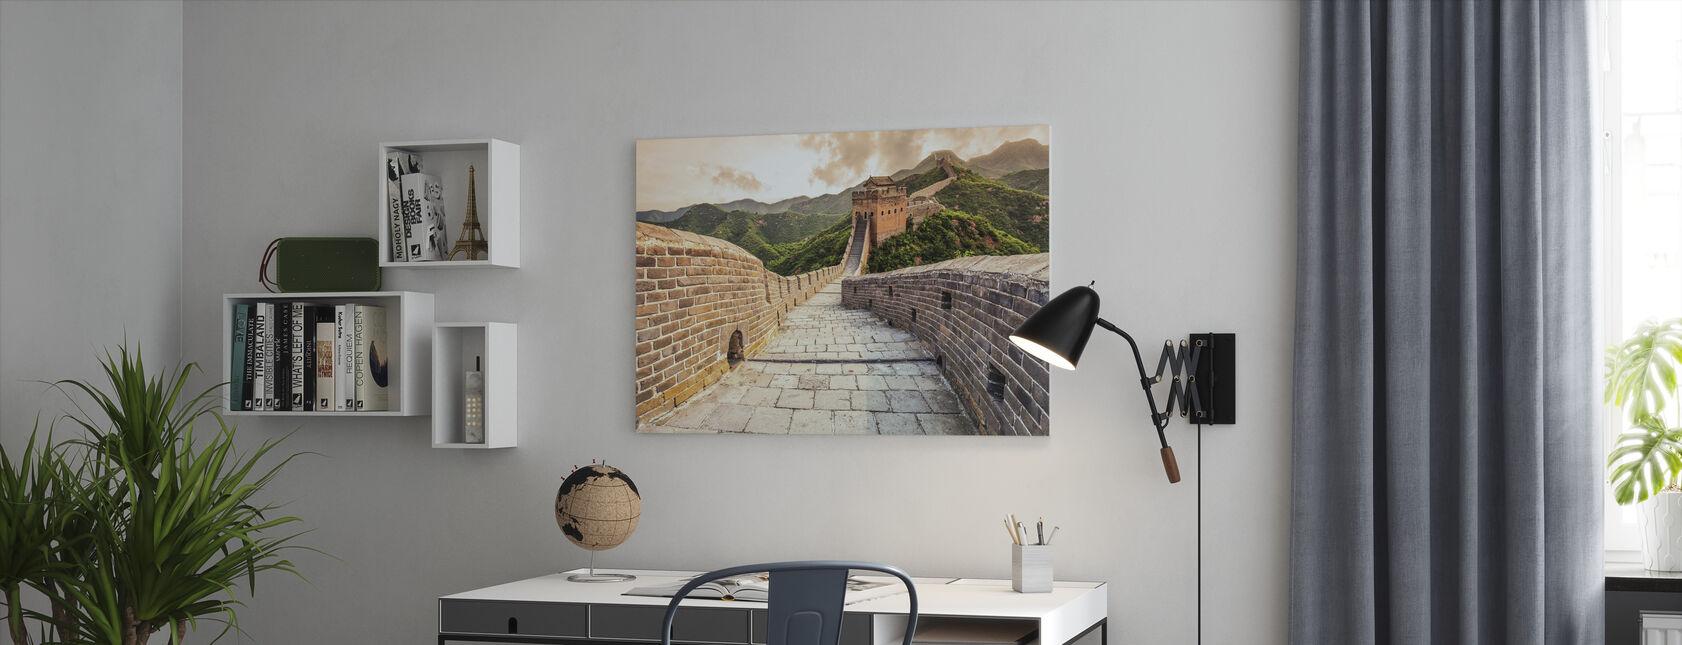 Kinas stora mur - Canvastavla - Kontor